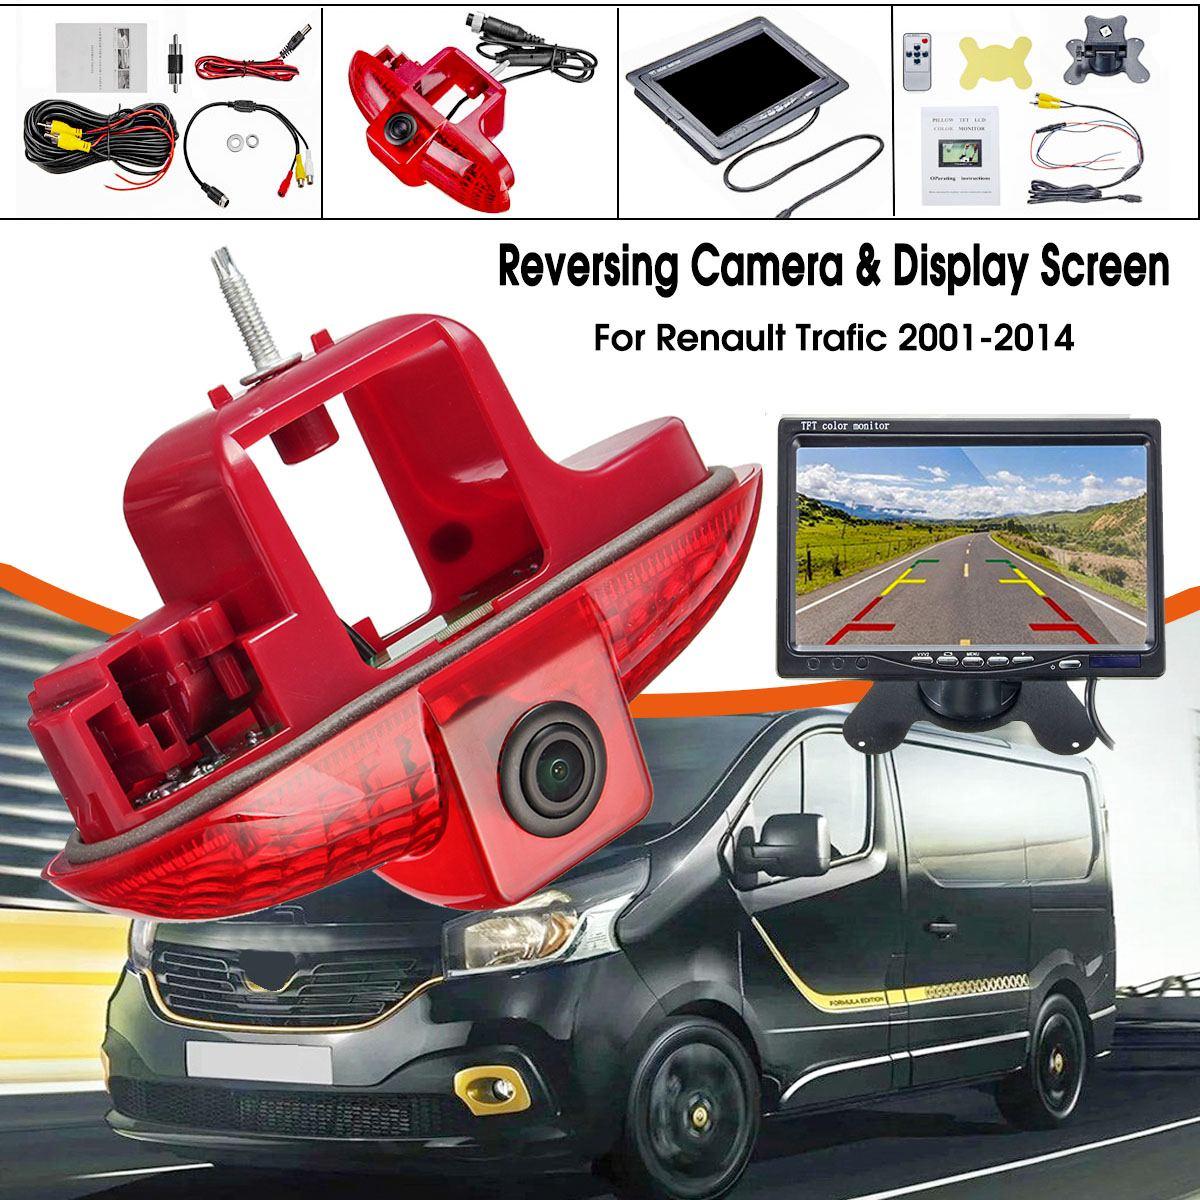 "CCD HD LED Auto coche 7 ""Monitor de visión trasera cámara de visión nocturna reversa para Renault Trafic 2001-2014 Trafic Opel Vivaro"